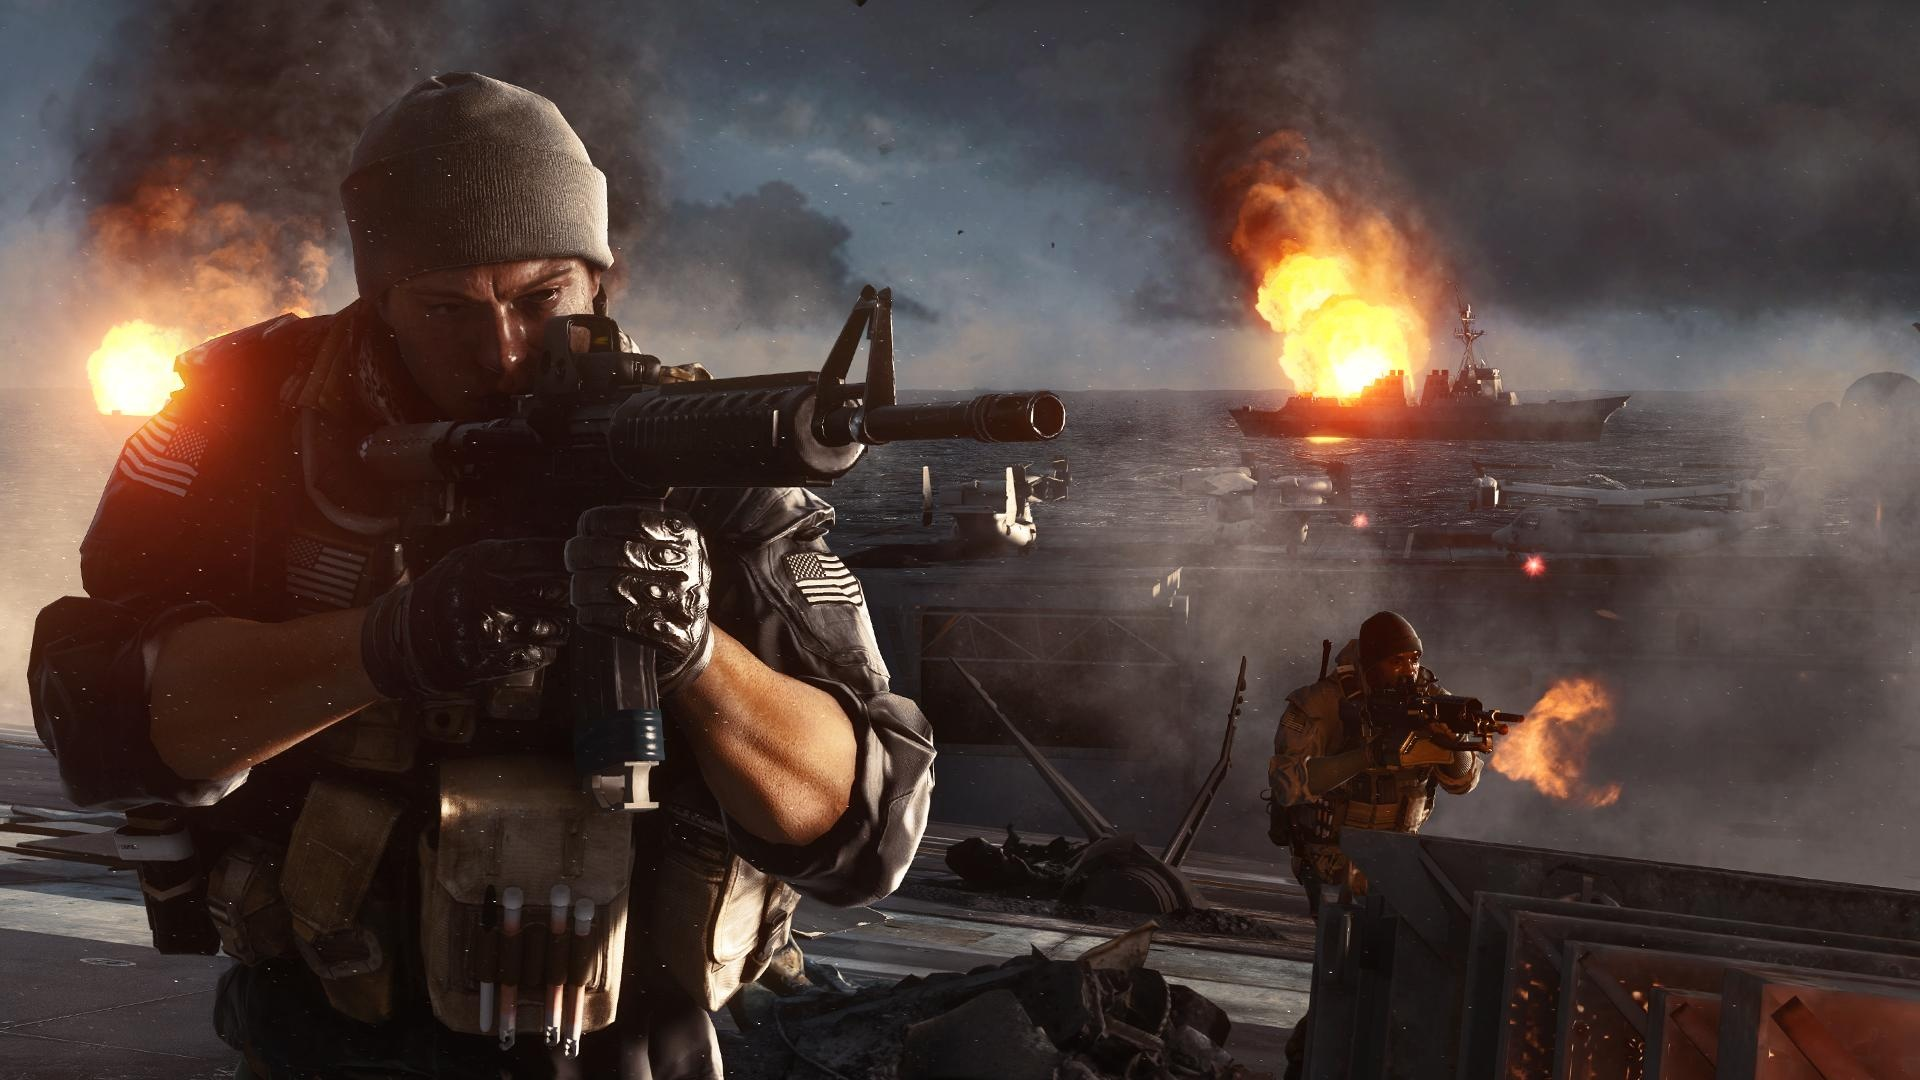 Battlefield4の船上での銃撃戦